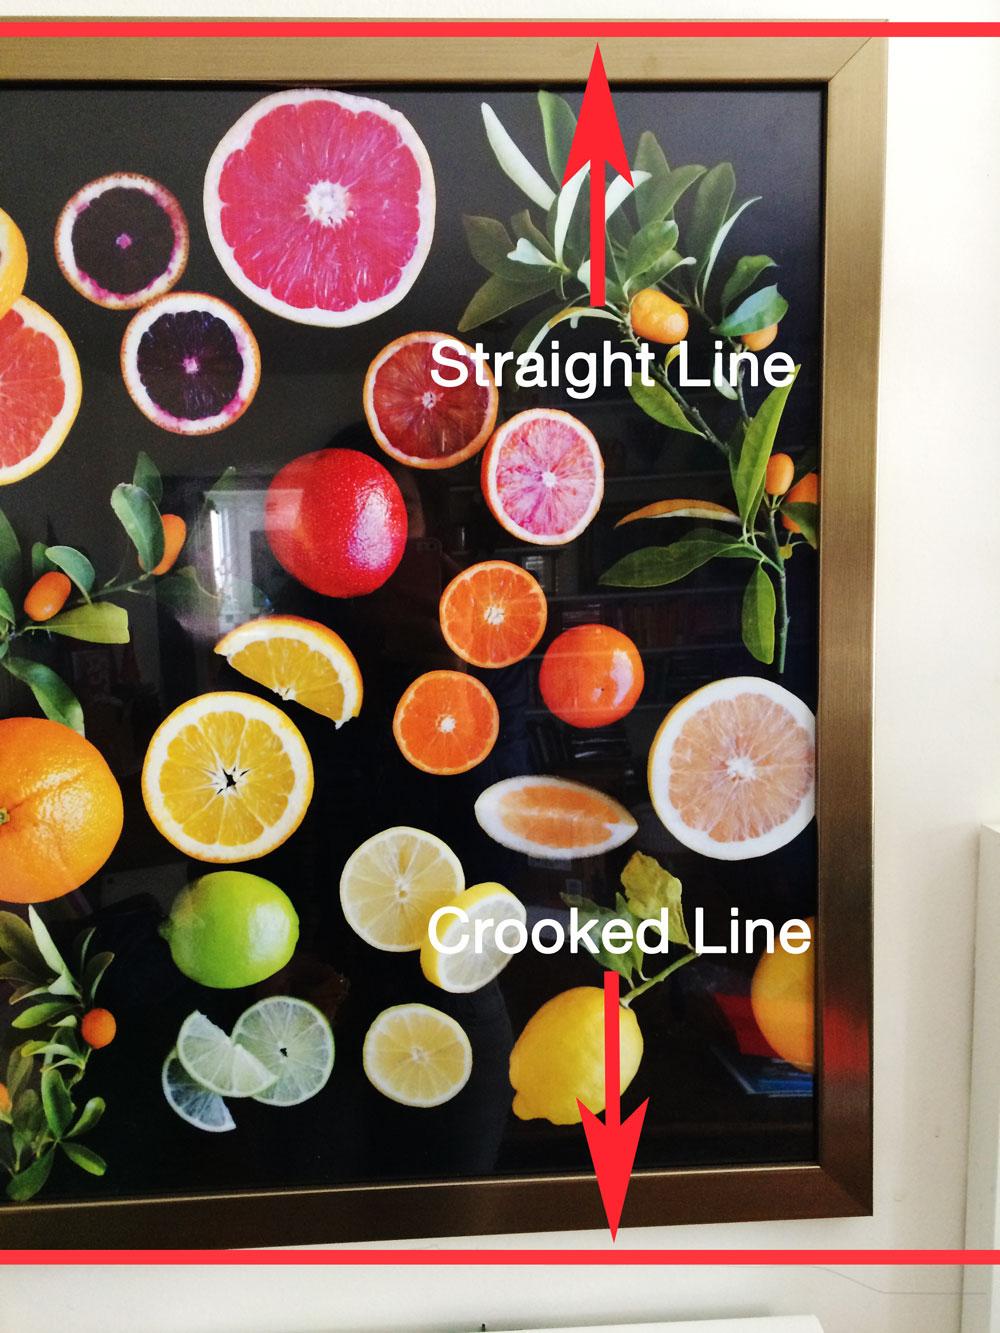 jestcafe.com-how-to-photograph-straight-lines10